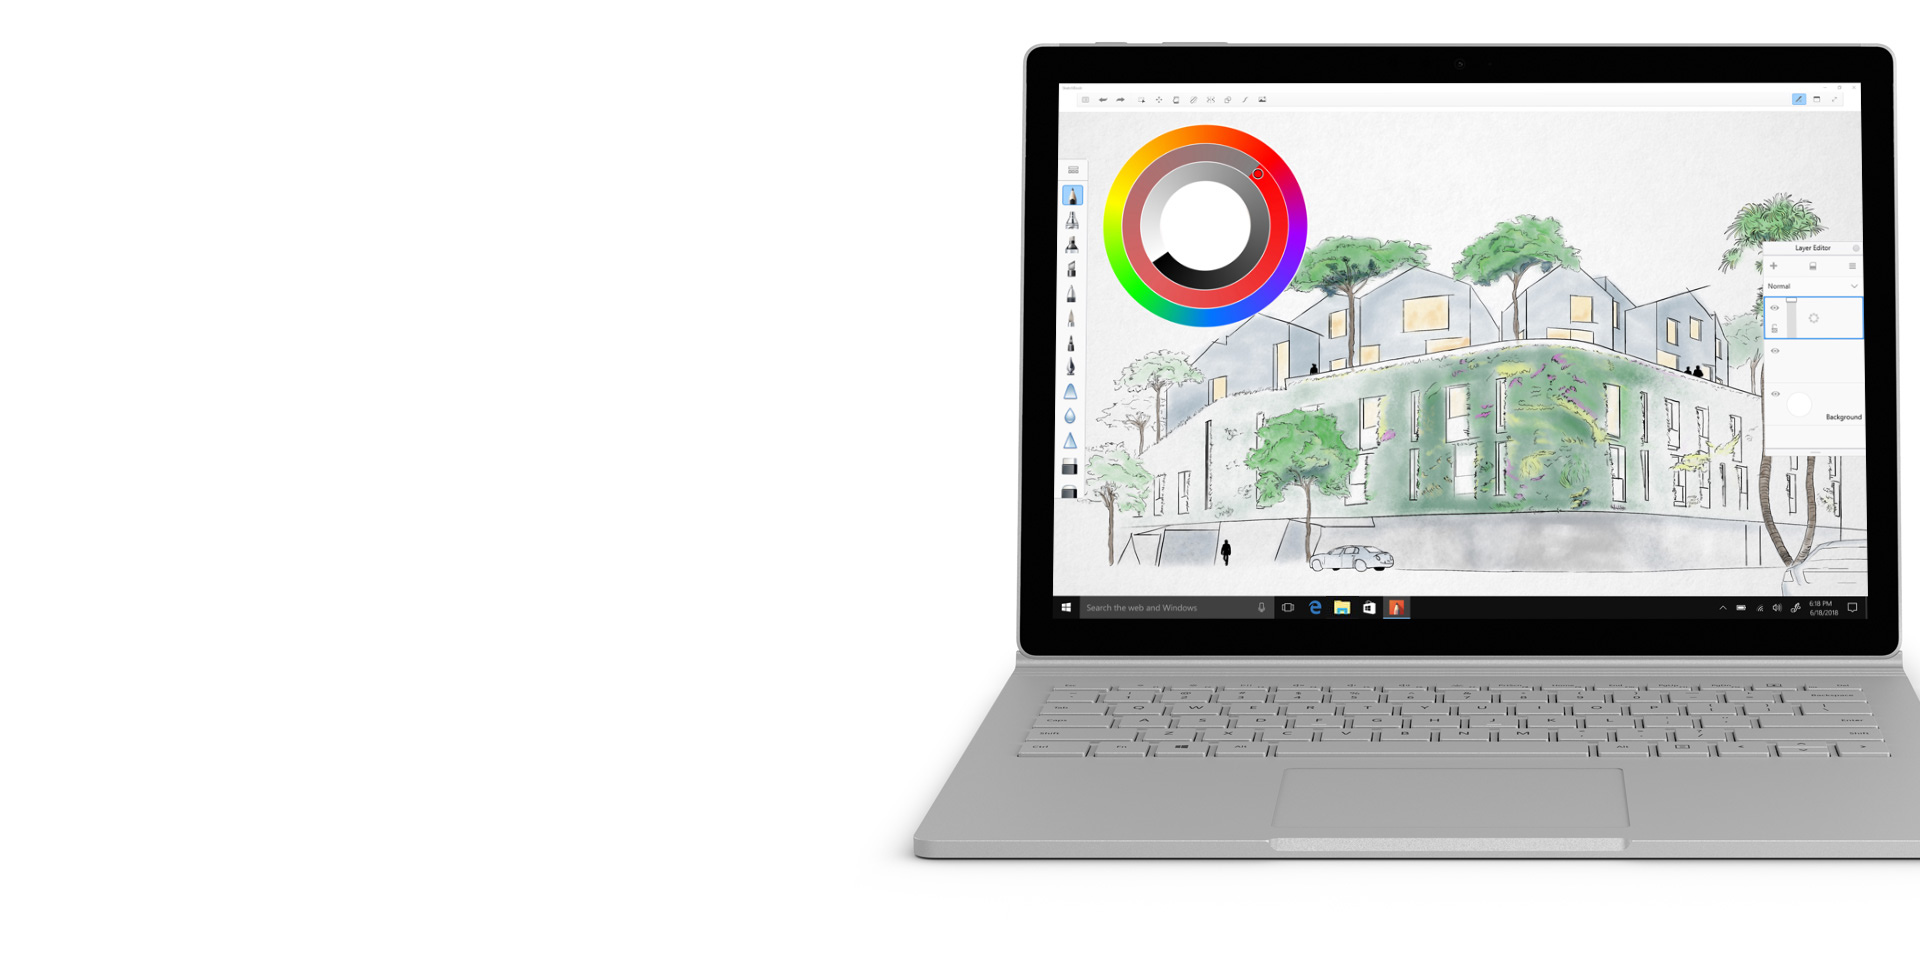 Paparan Autodesk SketchBook pada Surface Book 2